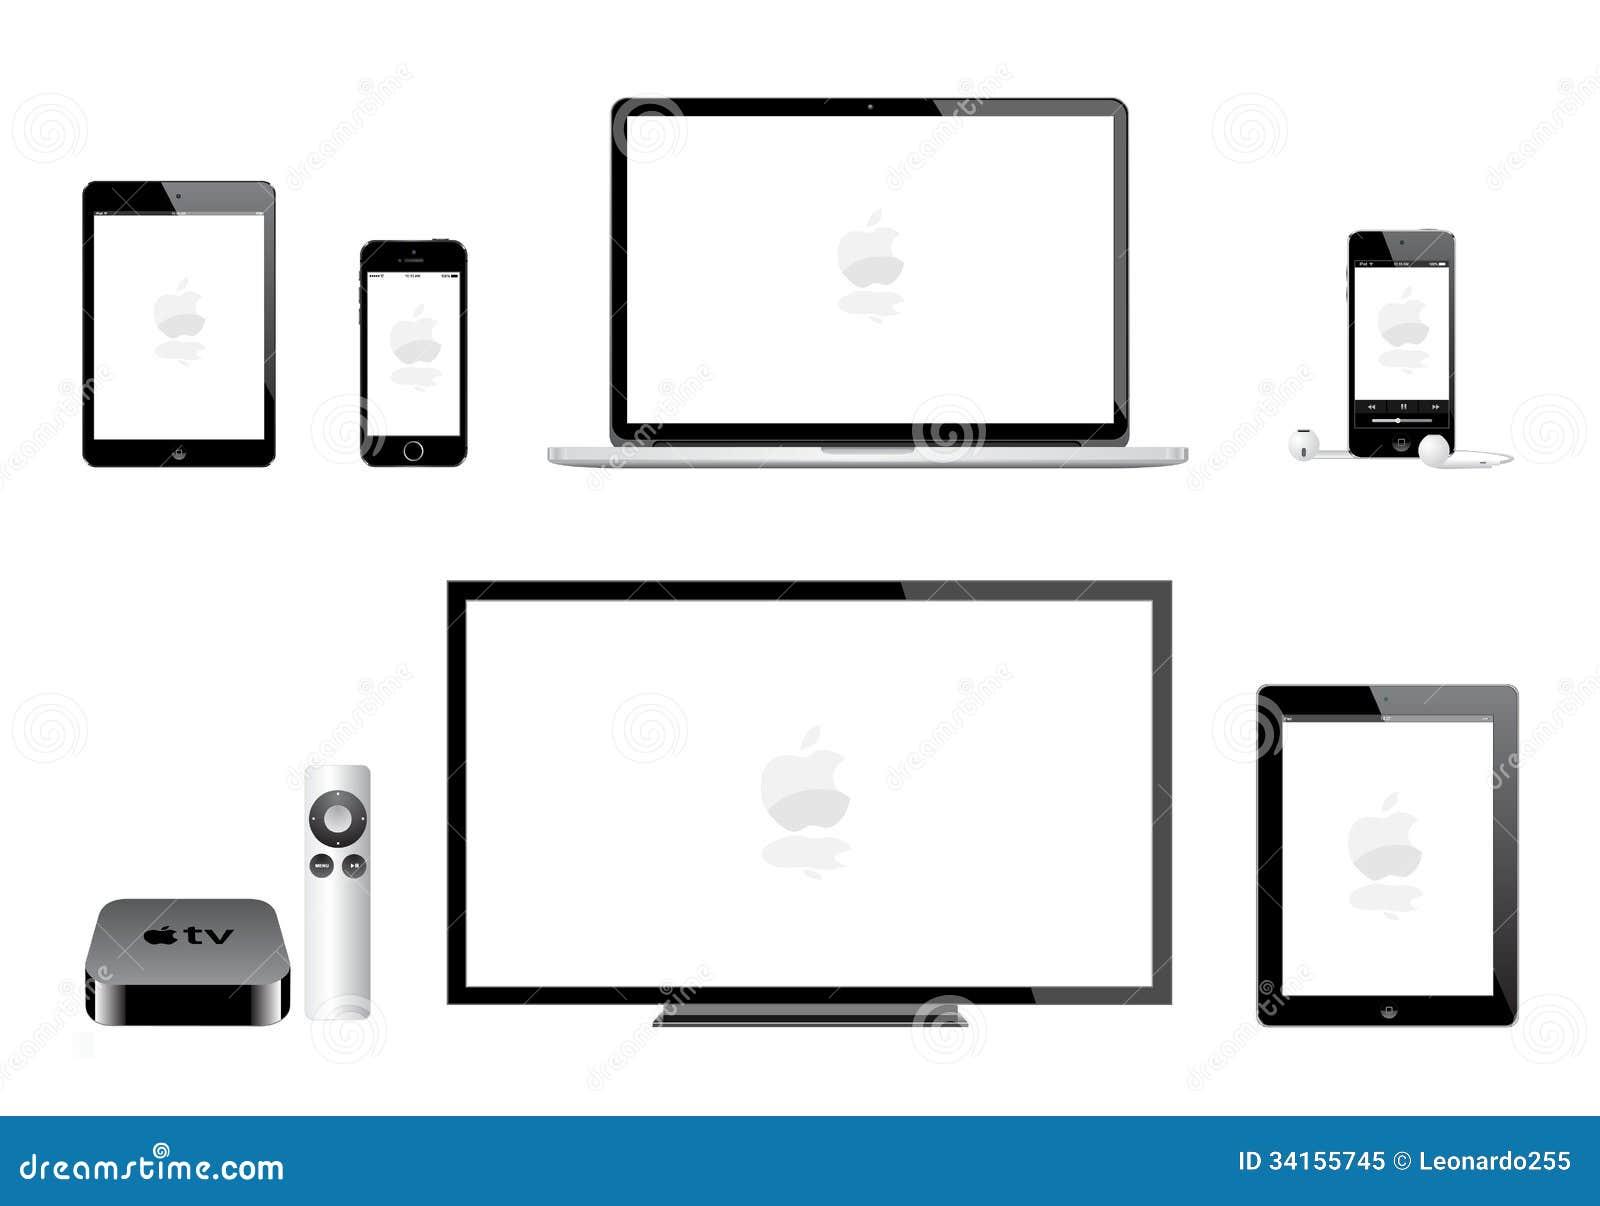 apple ipad mini iphone ipod mac tv vector eps 34155745 mac tv diagram schematics wiring diagram